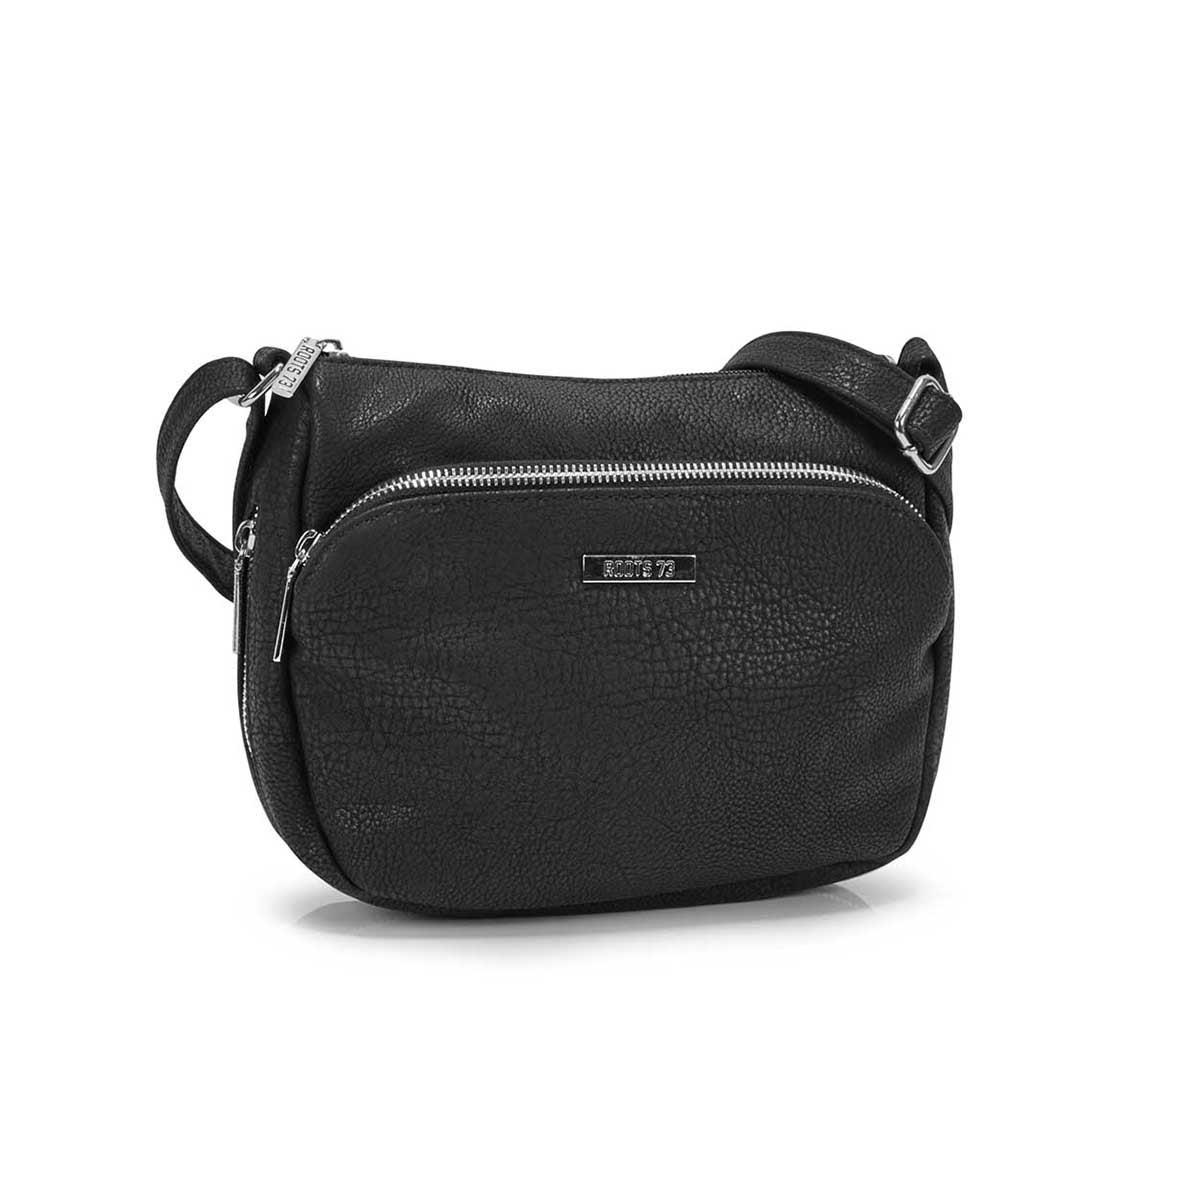 Women's R5209 black crossbody bag